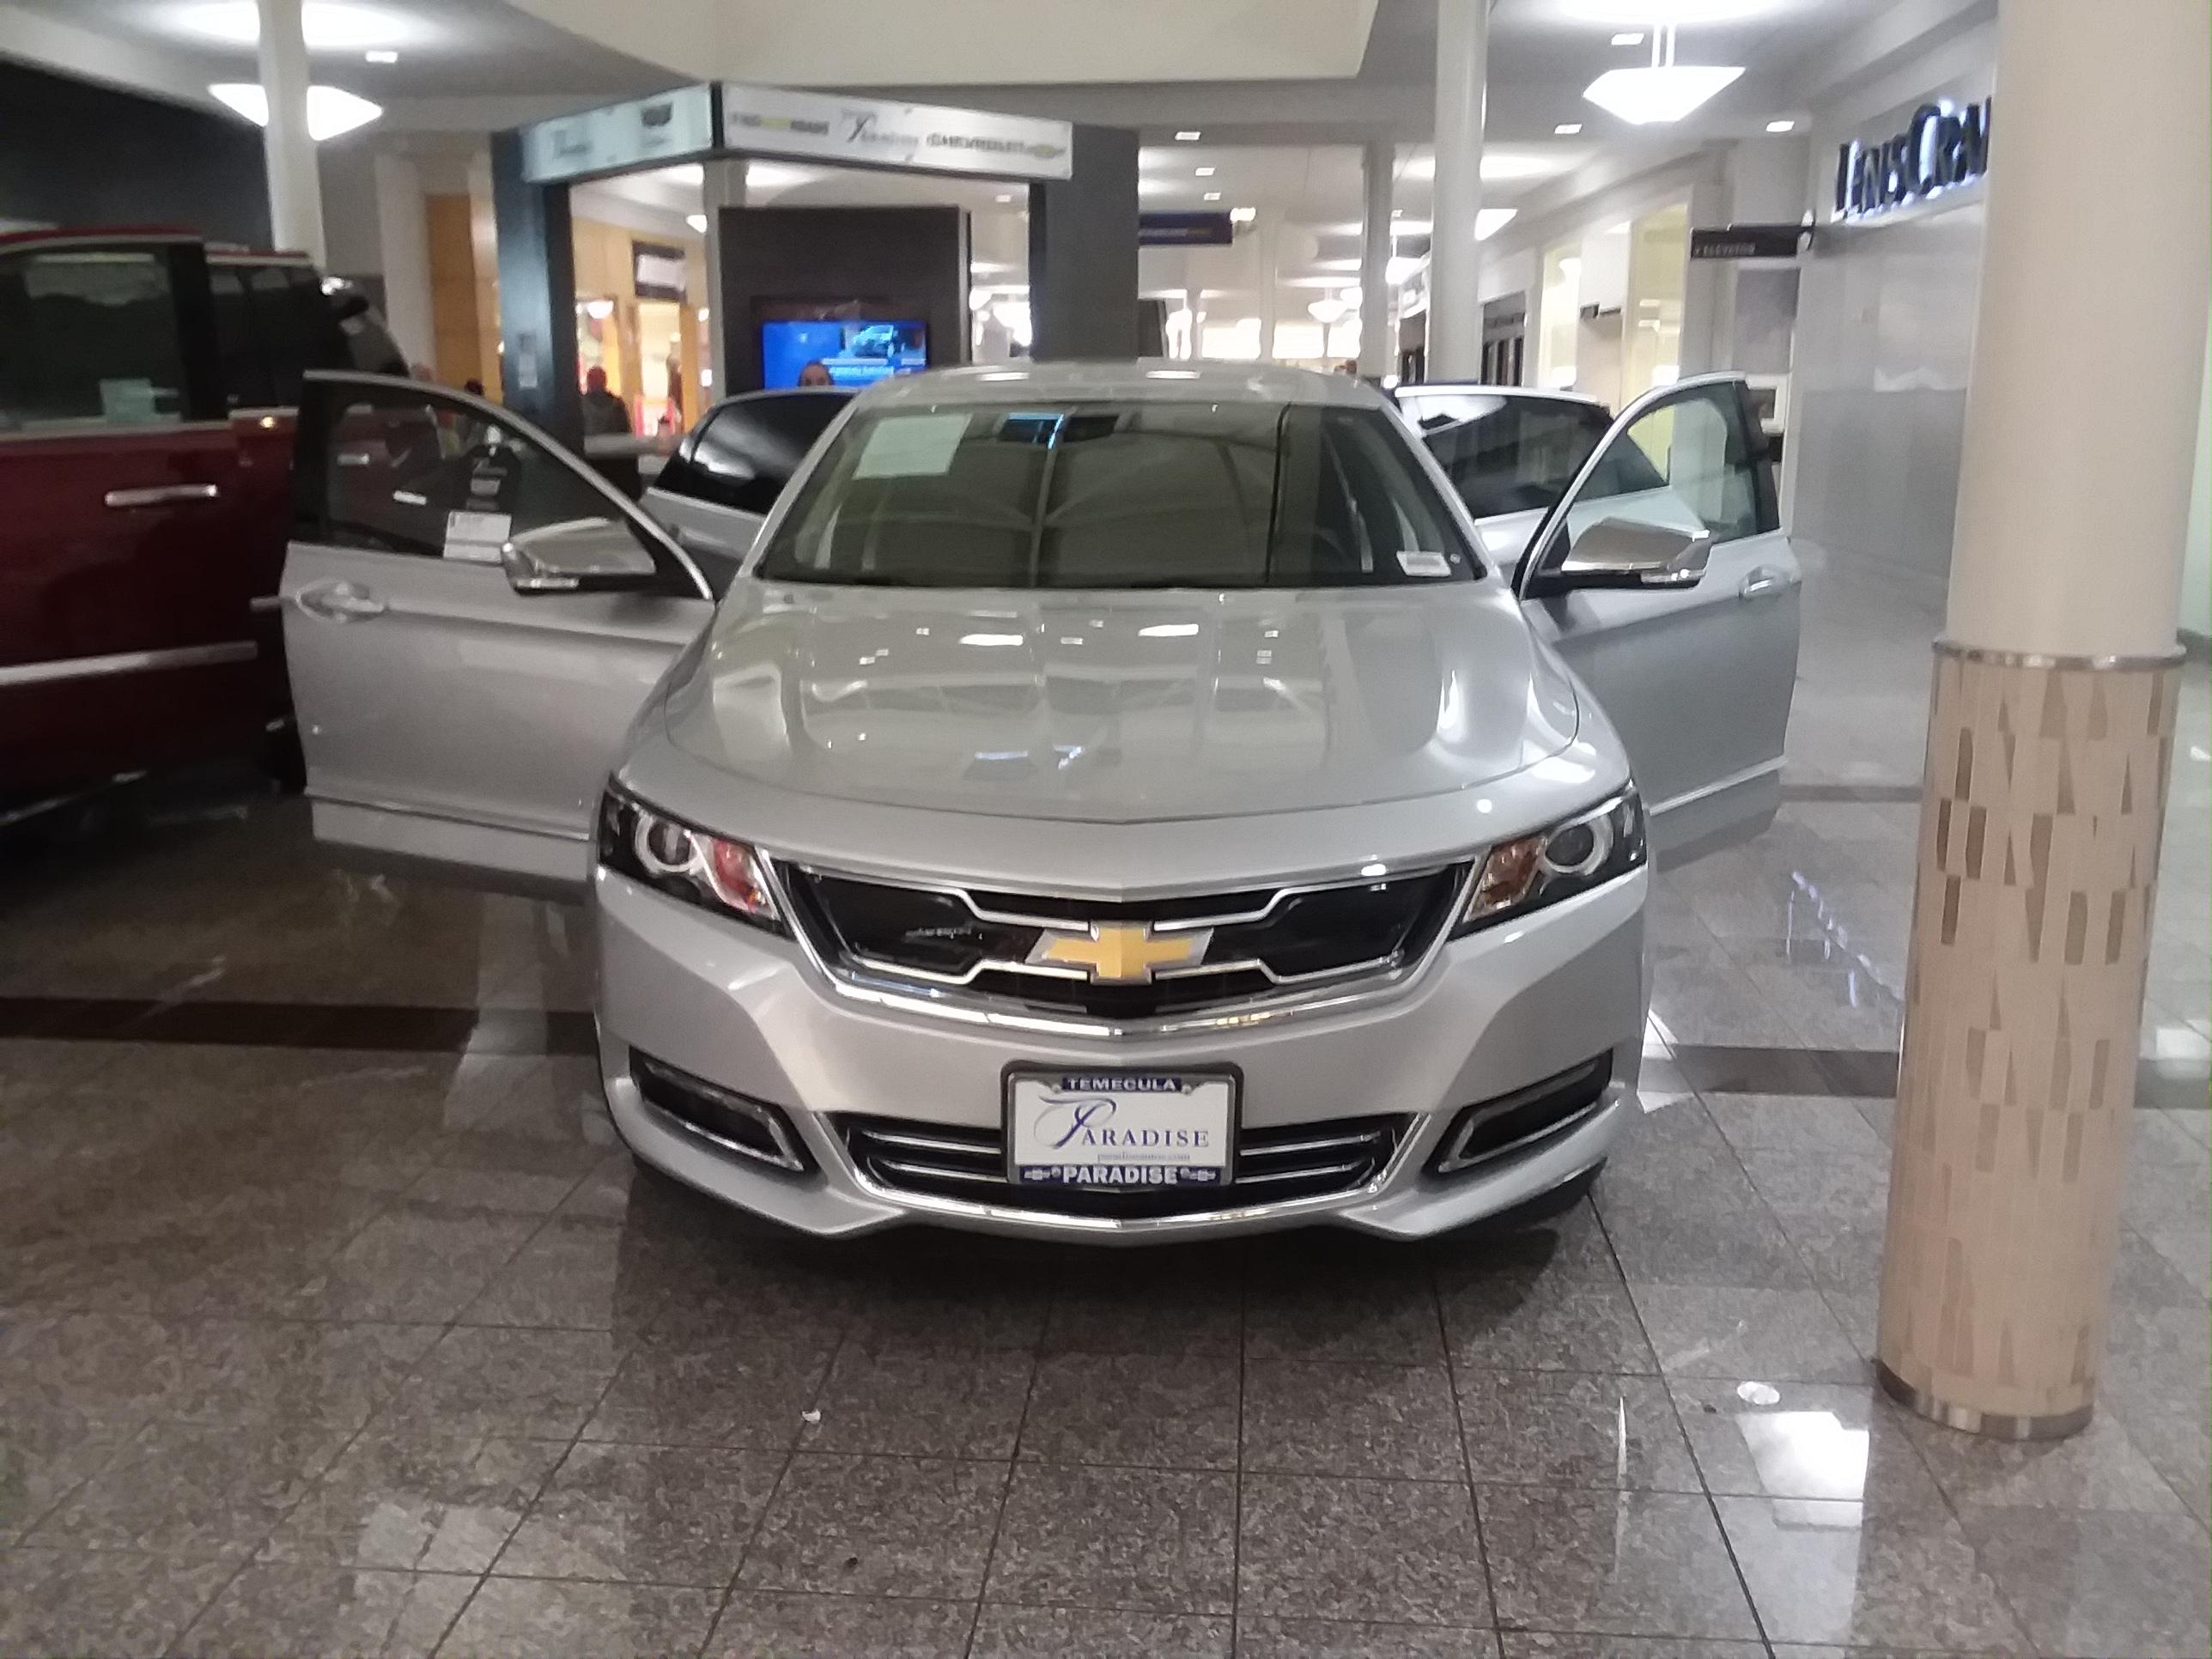 Image result for chevrolet impala 2018